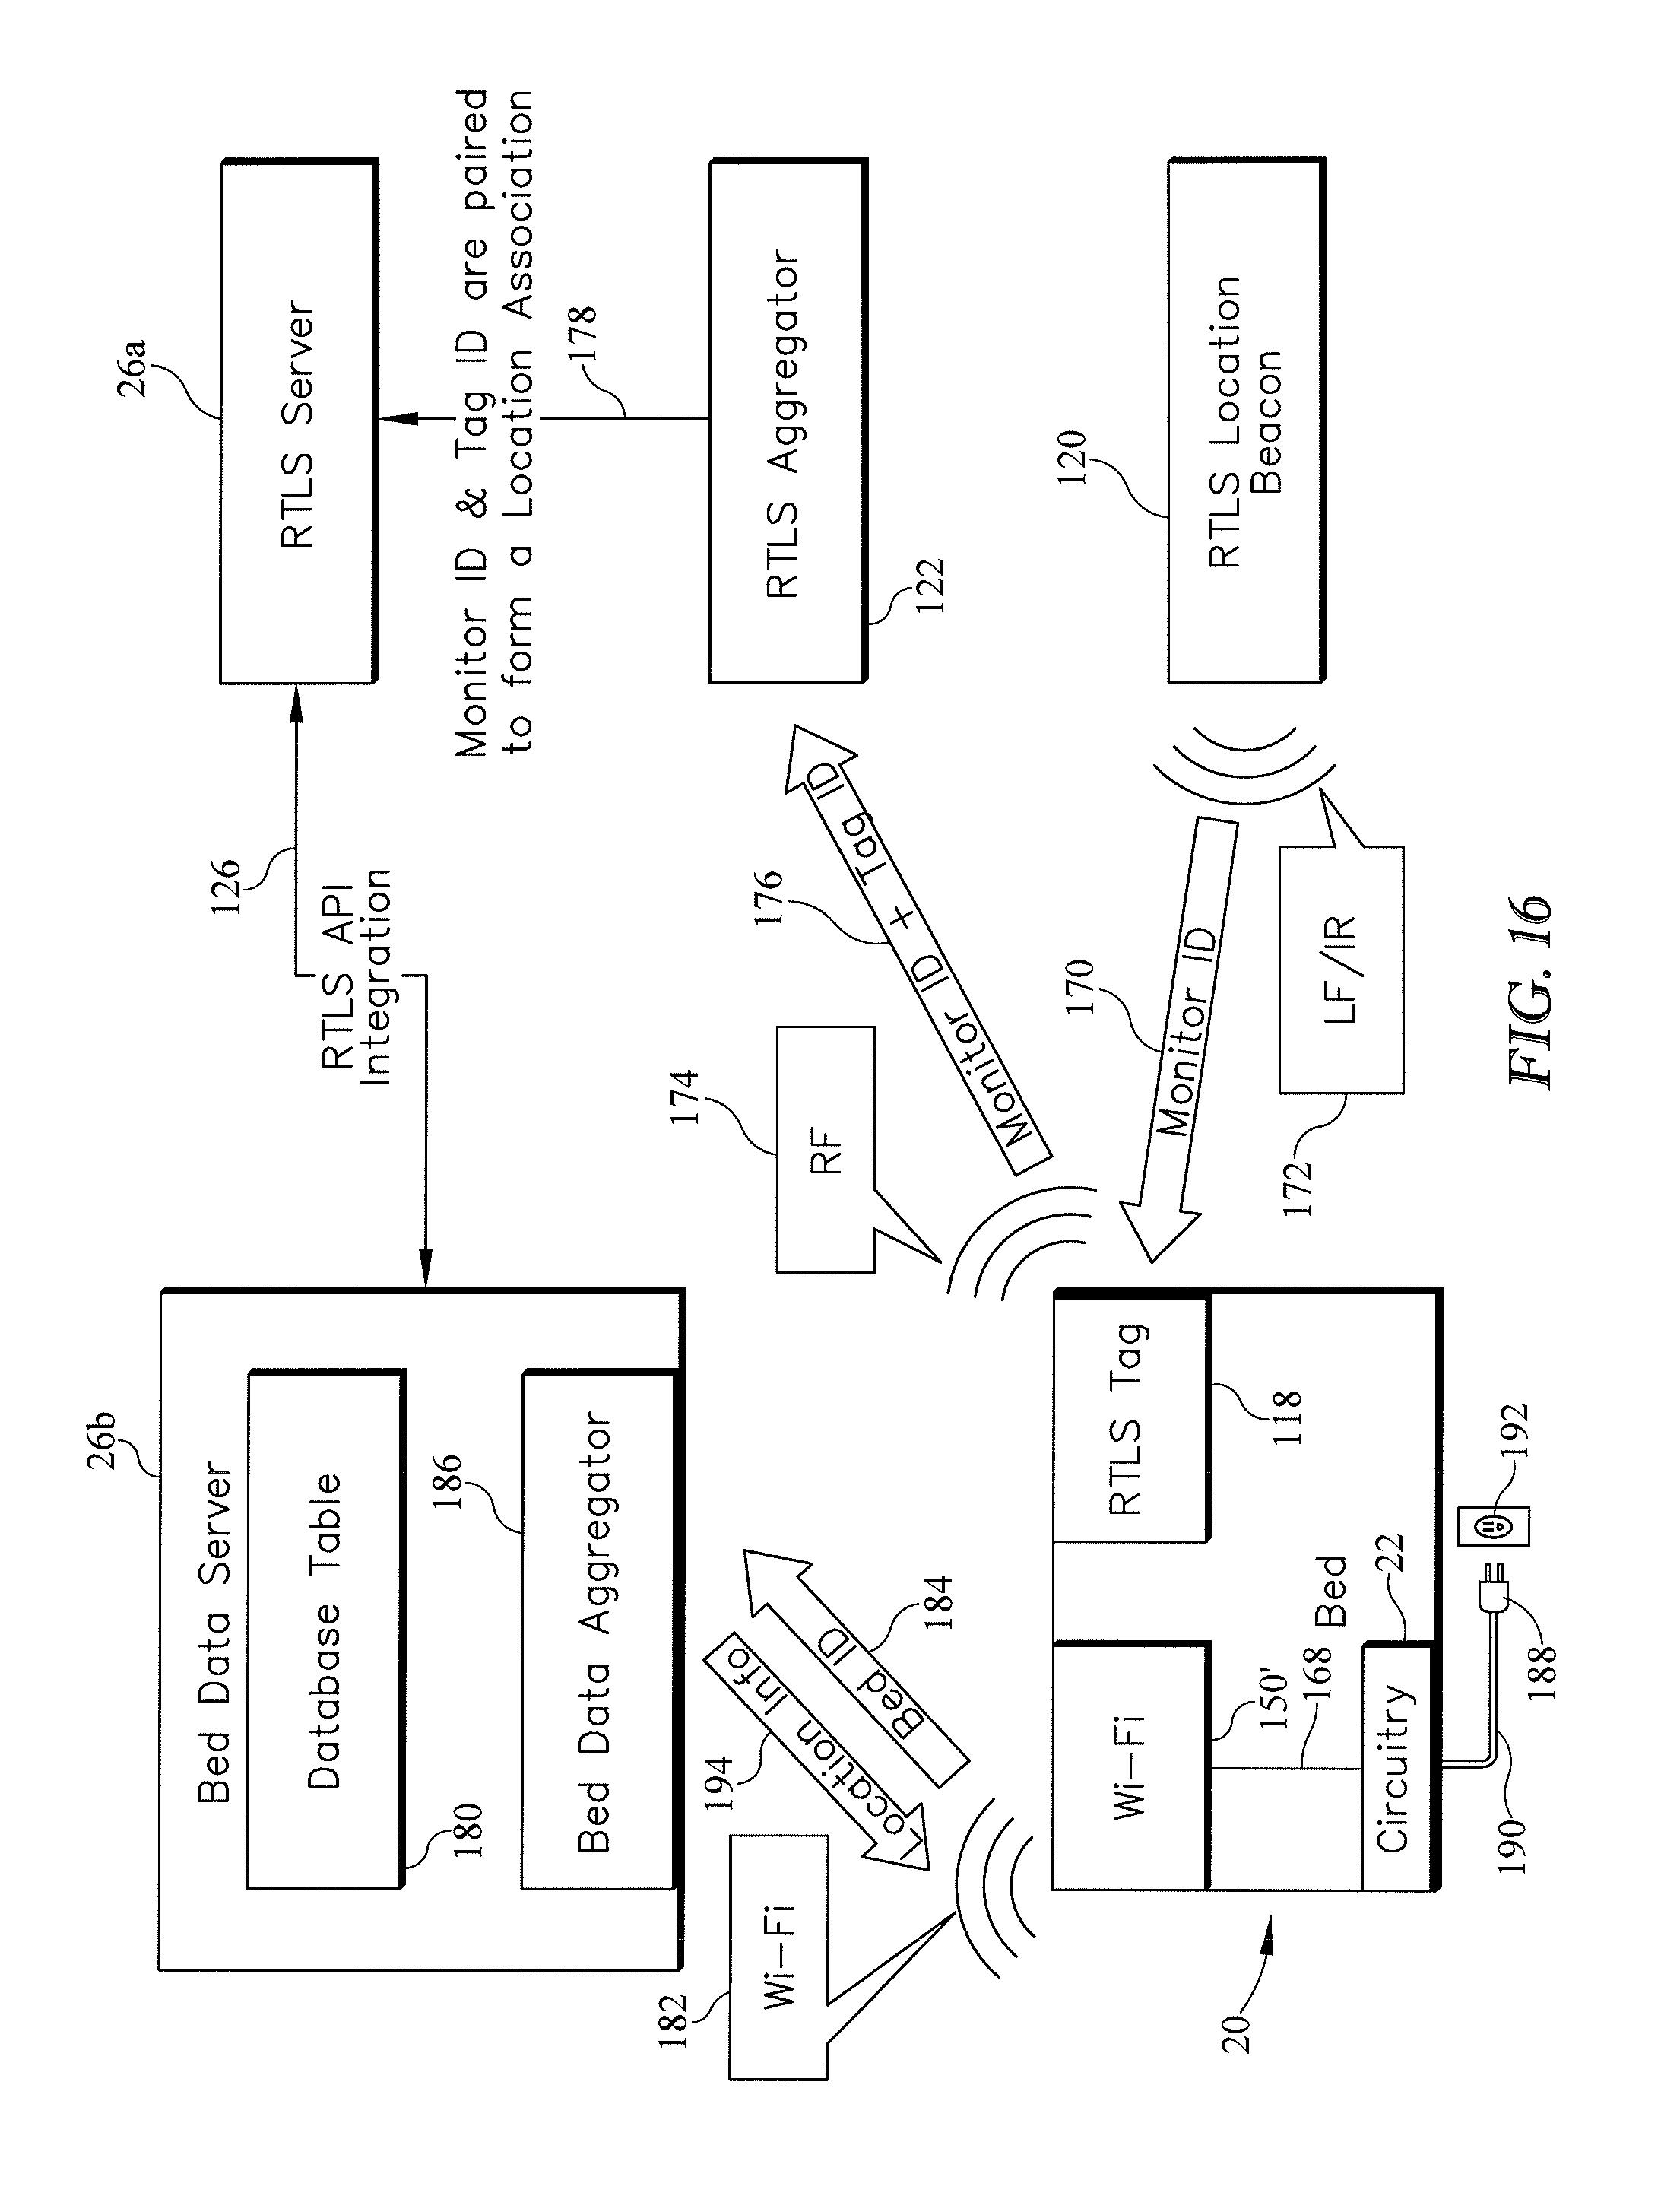 Patent US 9,830,424 B2 on